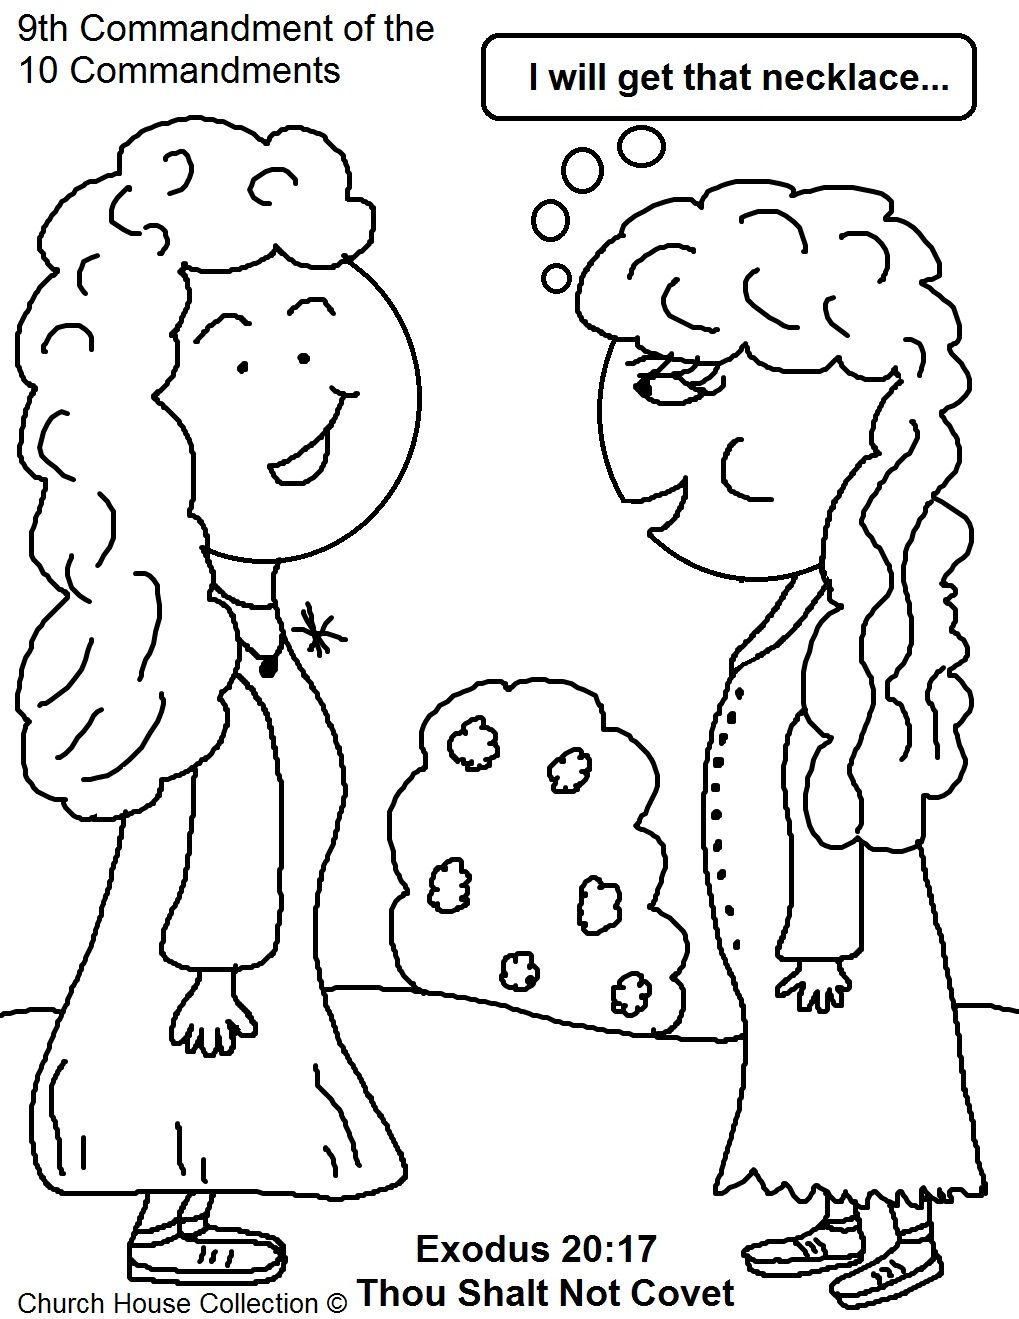 commandment page ten coloring sheets blog thou shalt not covet coloring